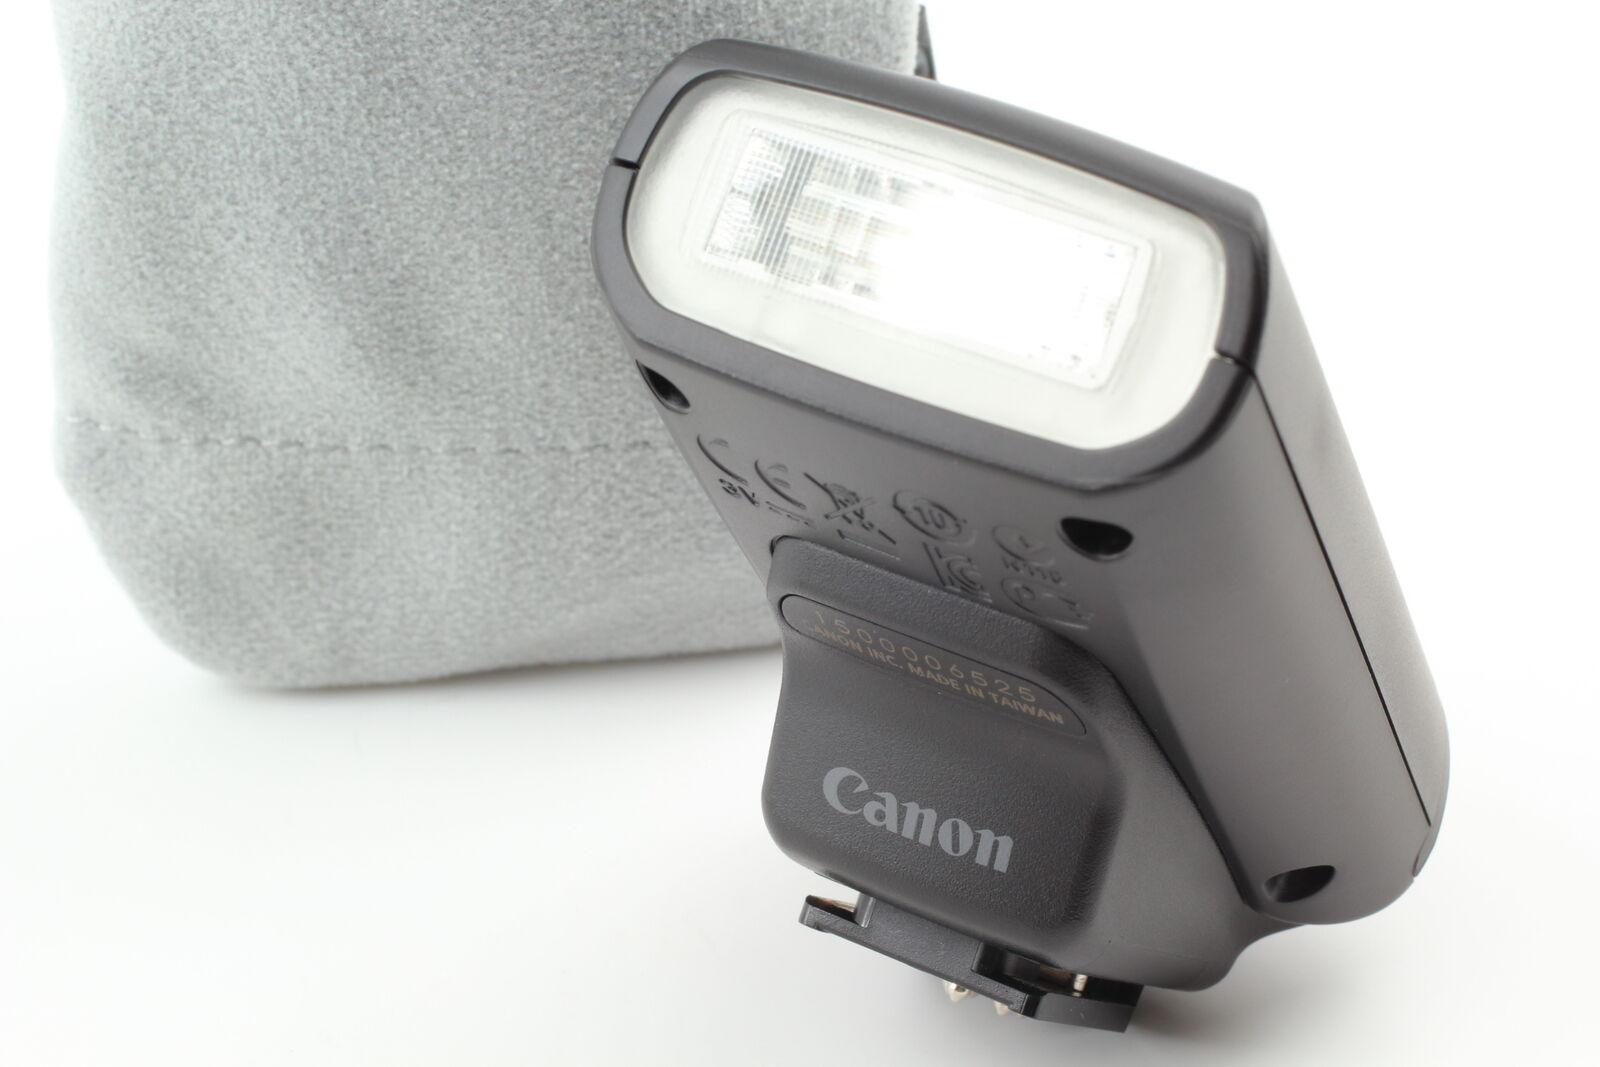 [MINT] Canon 90EX Speedlite w/ Soft Case From JAPAN